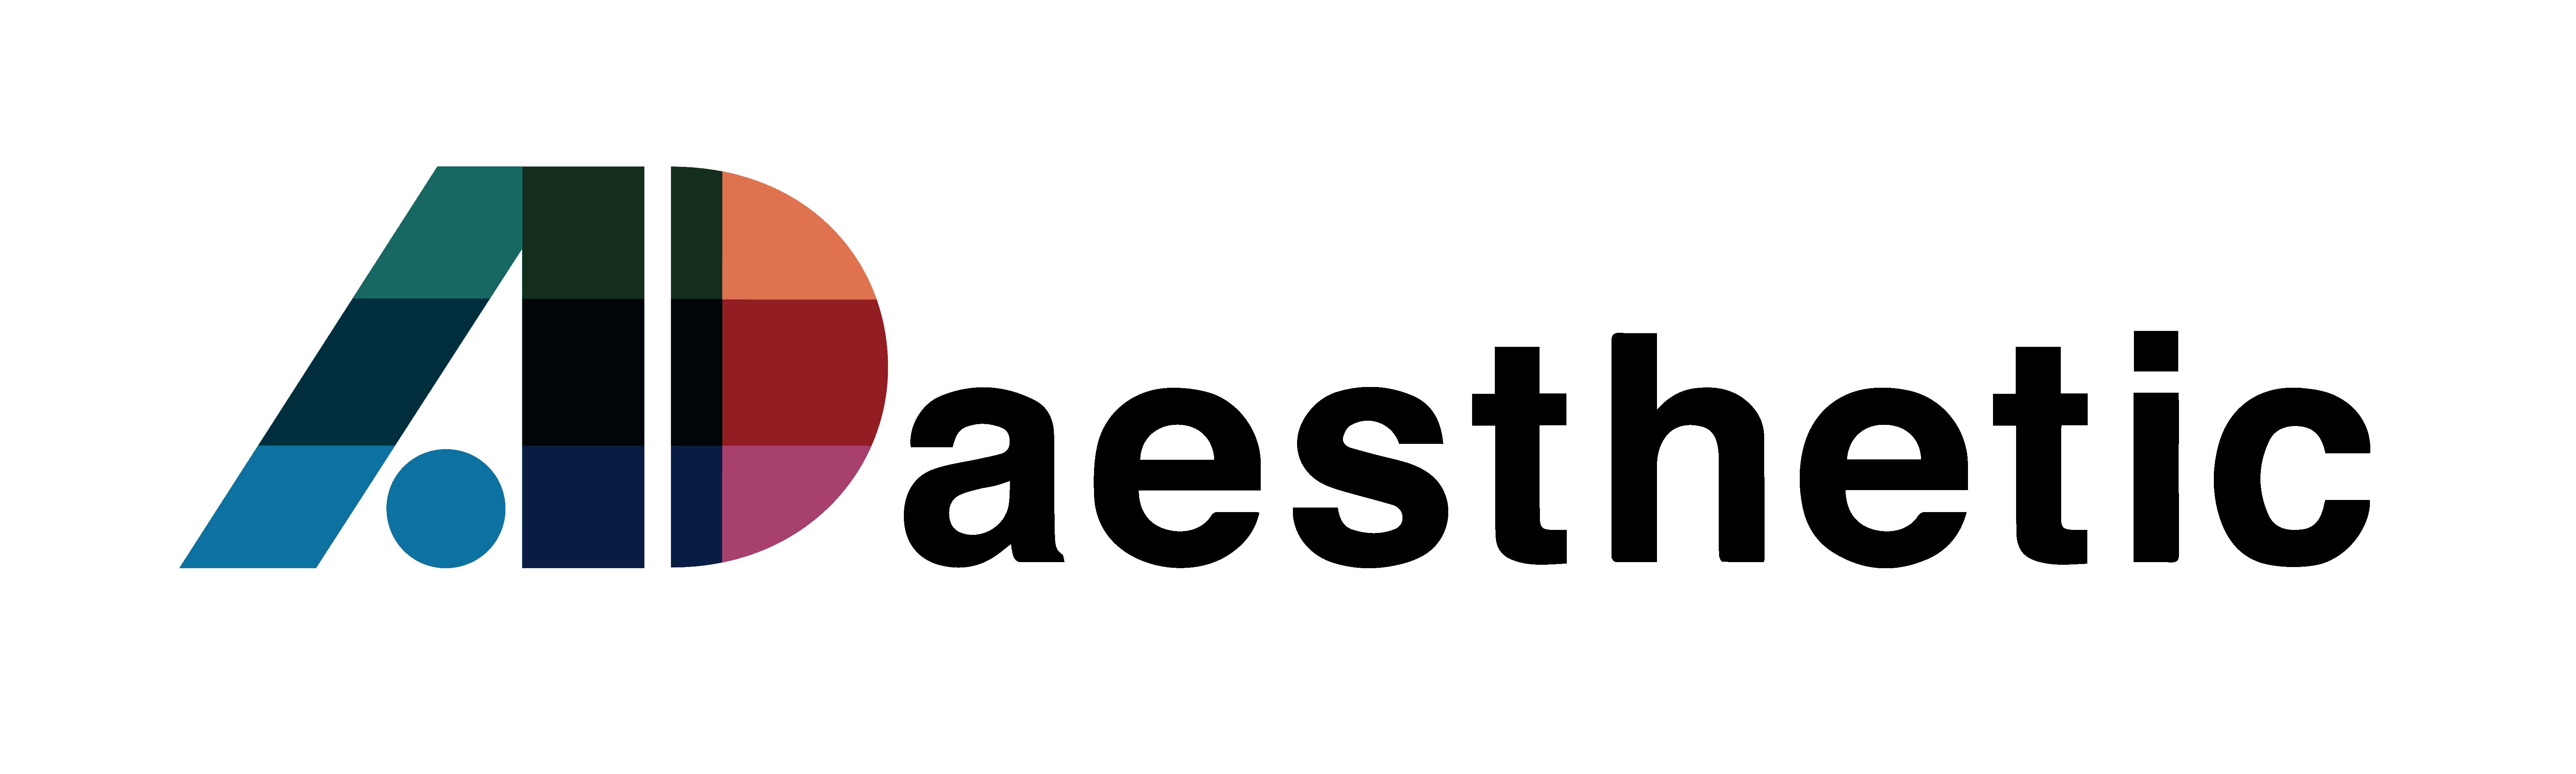 AD Aesthetic Logo